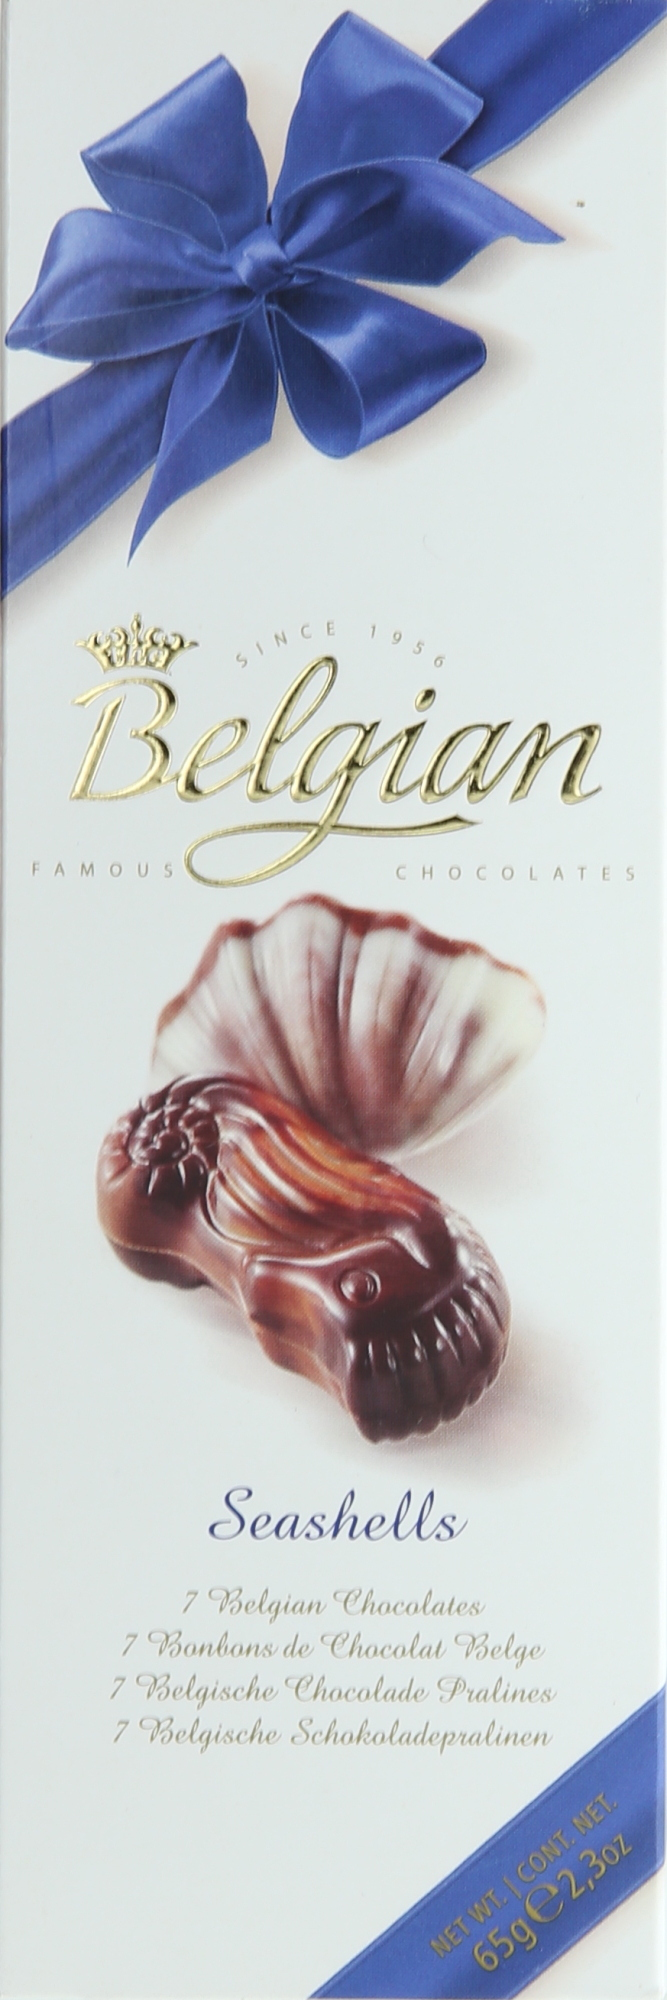 BELGIAN CHOCO SEASHELL 65GR